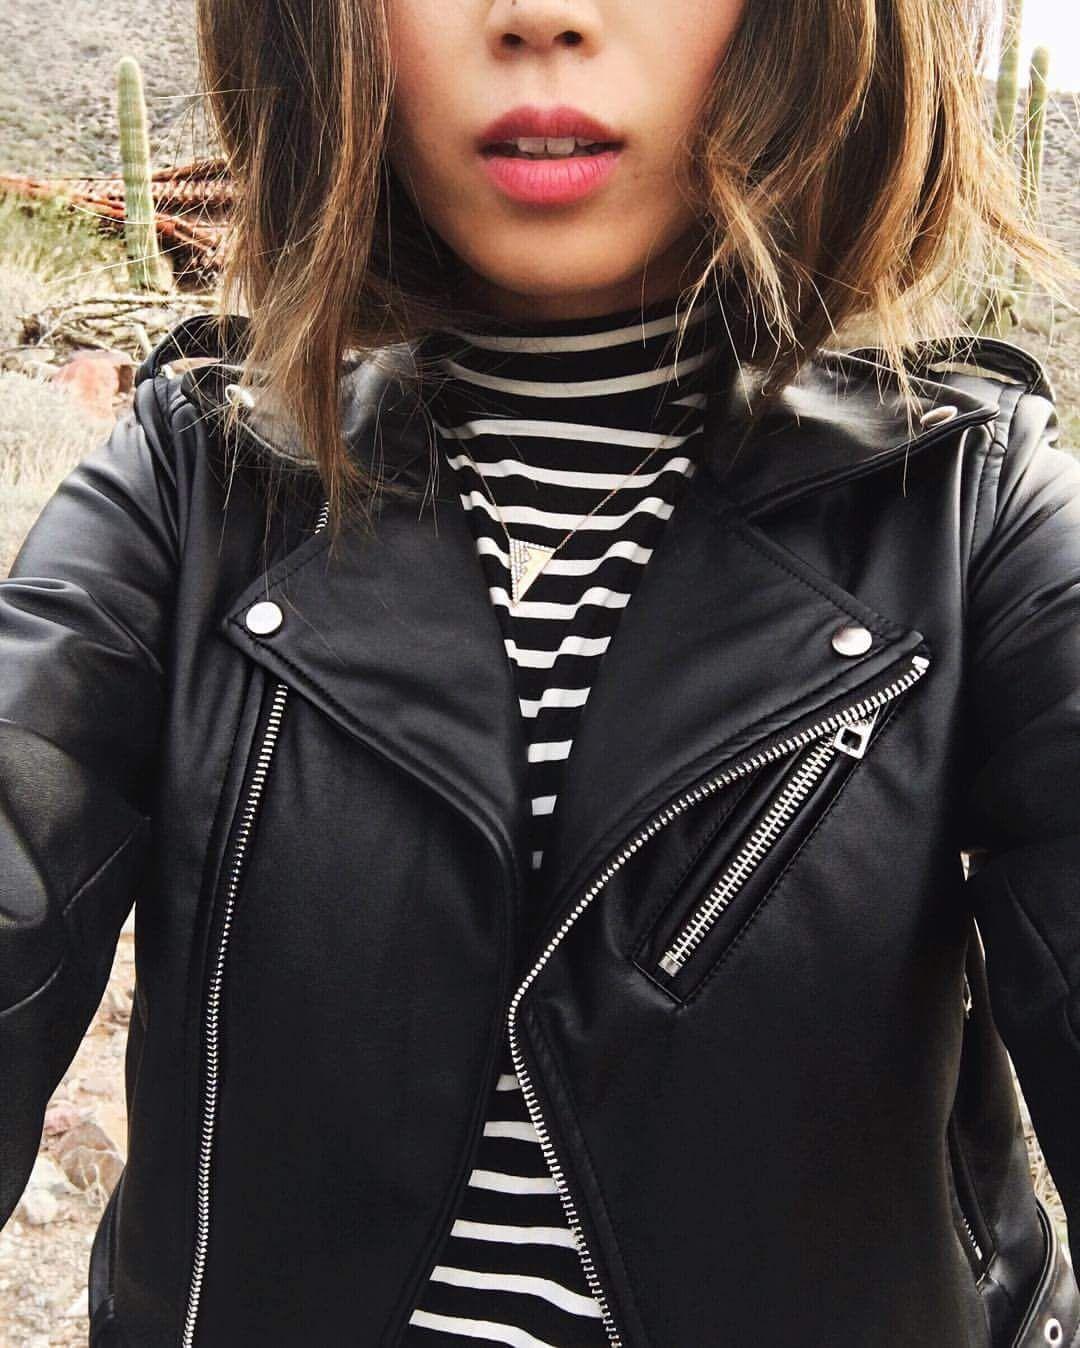 ea1df0dcfaf striped turtleneck and leather jacket combo